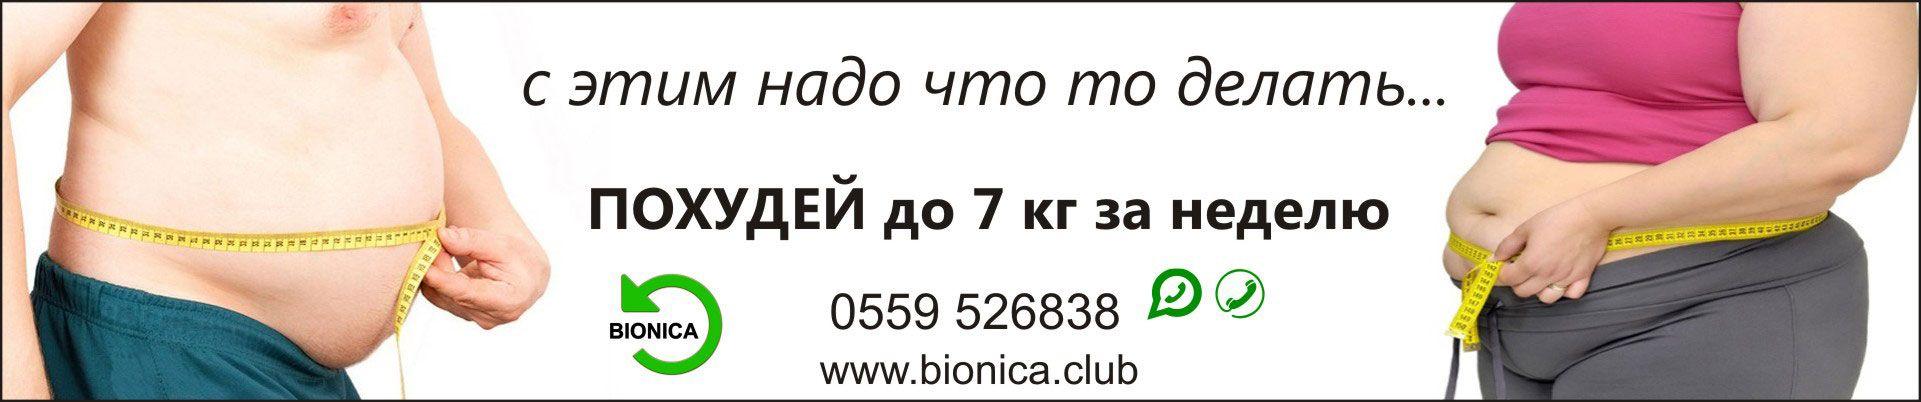 Коктейль для похудения 2250с (-10-11кг за месяц 5-6 кг за месяц.